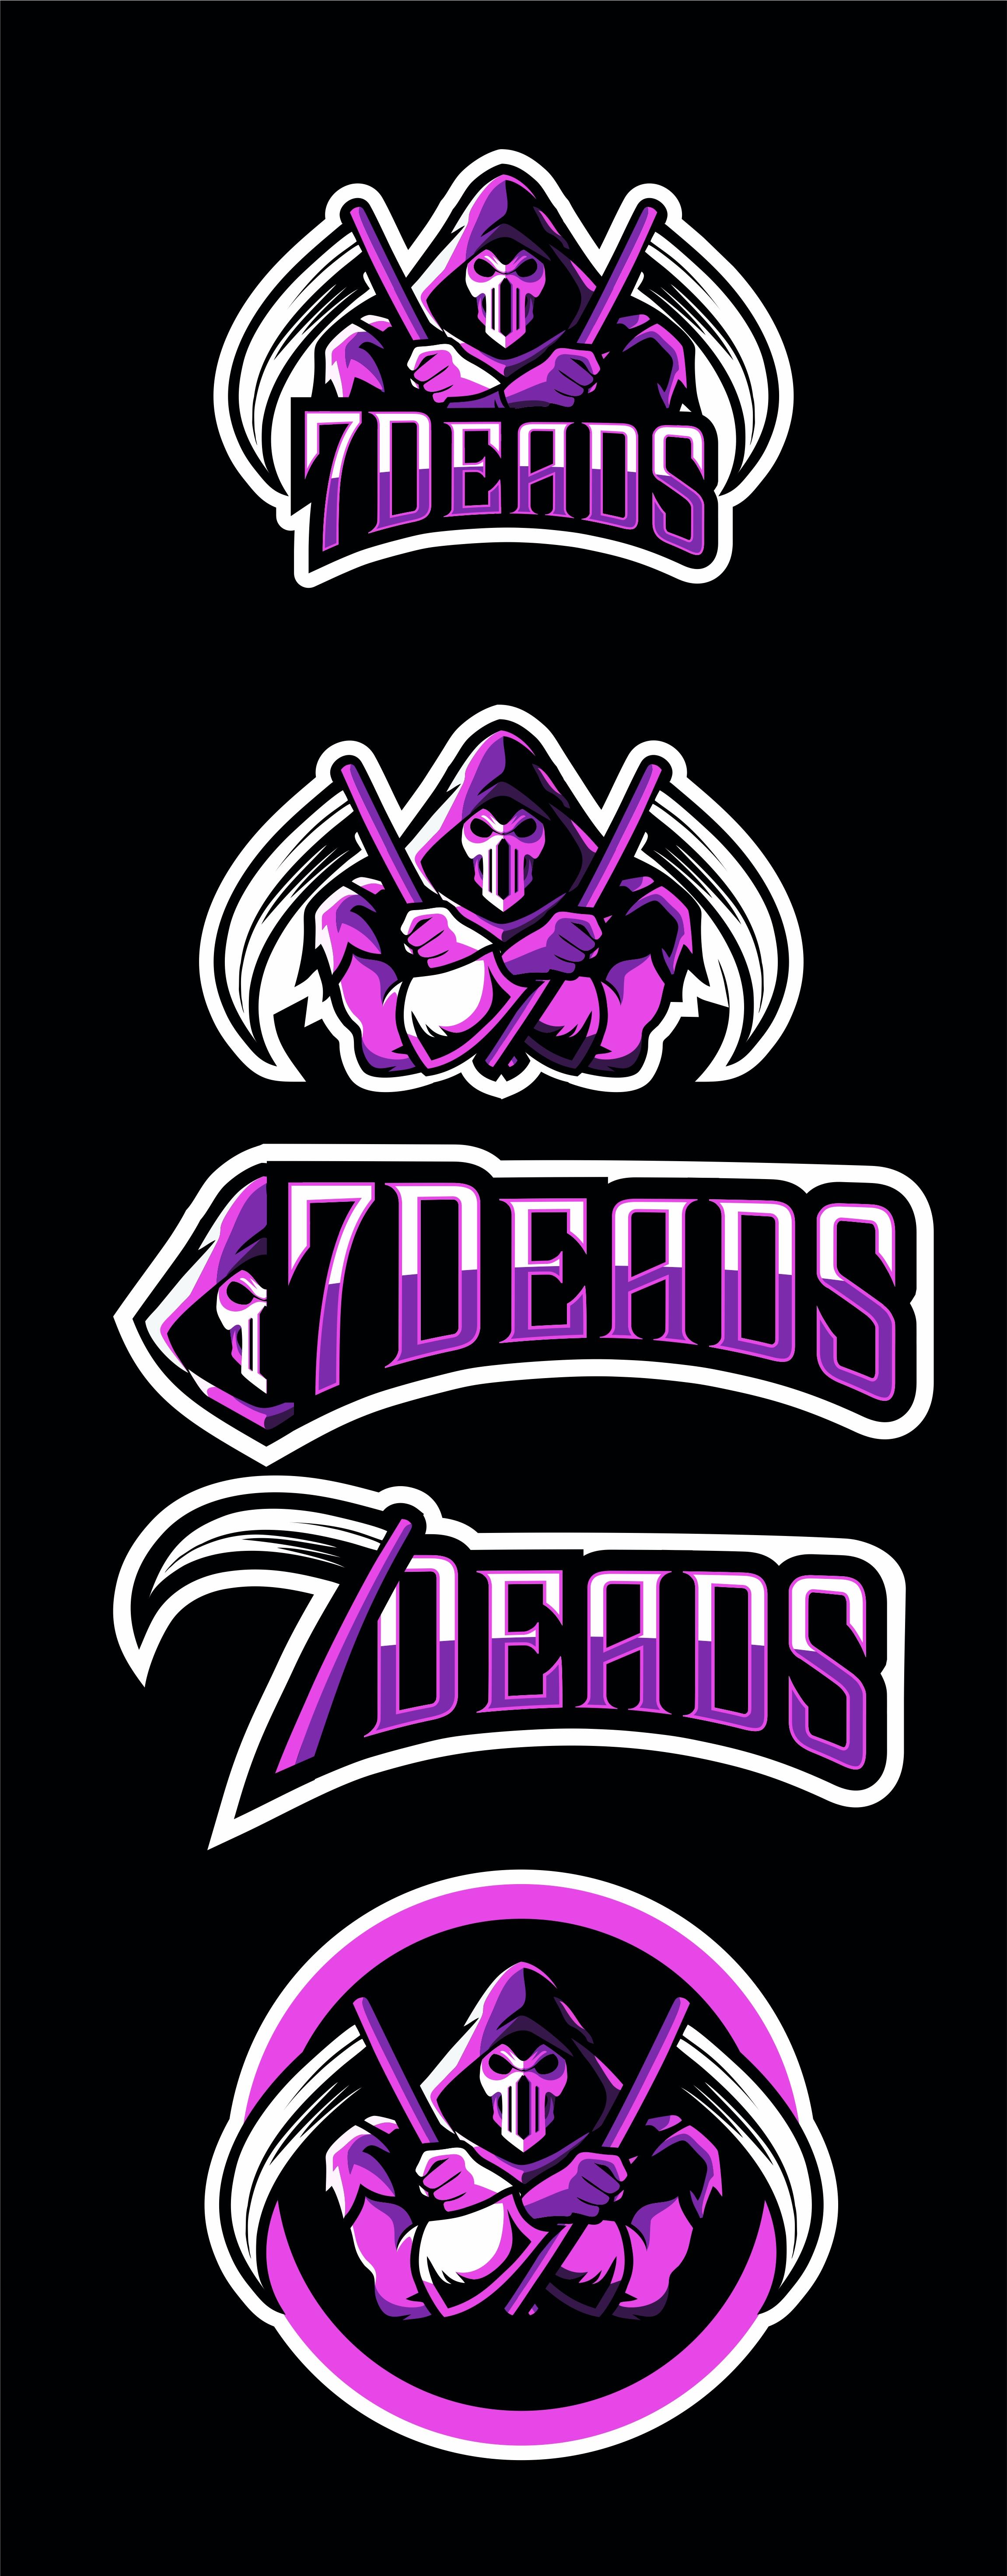 7Deads